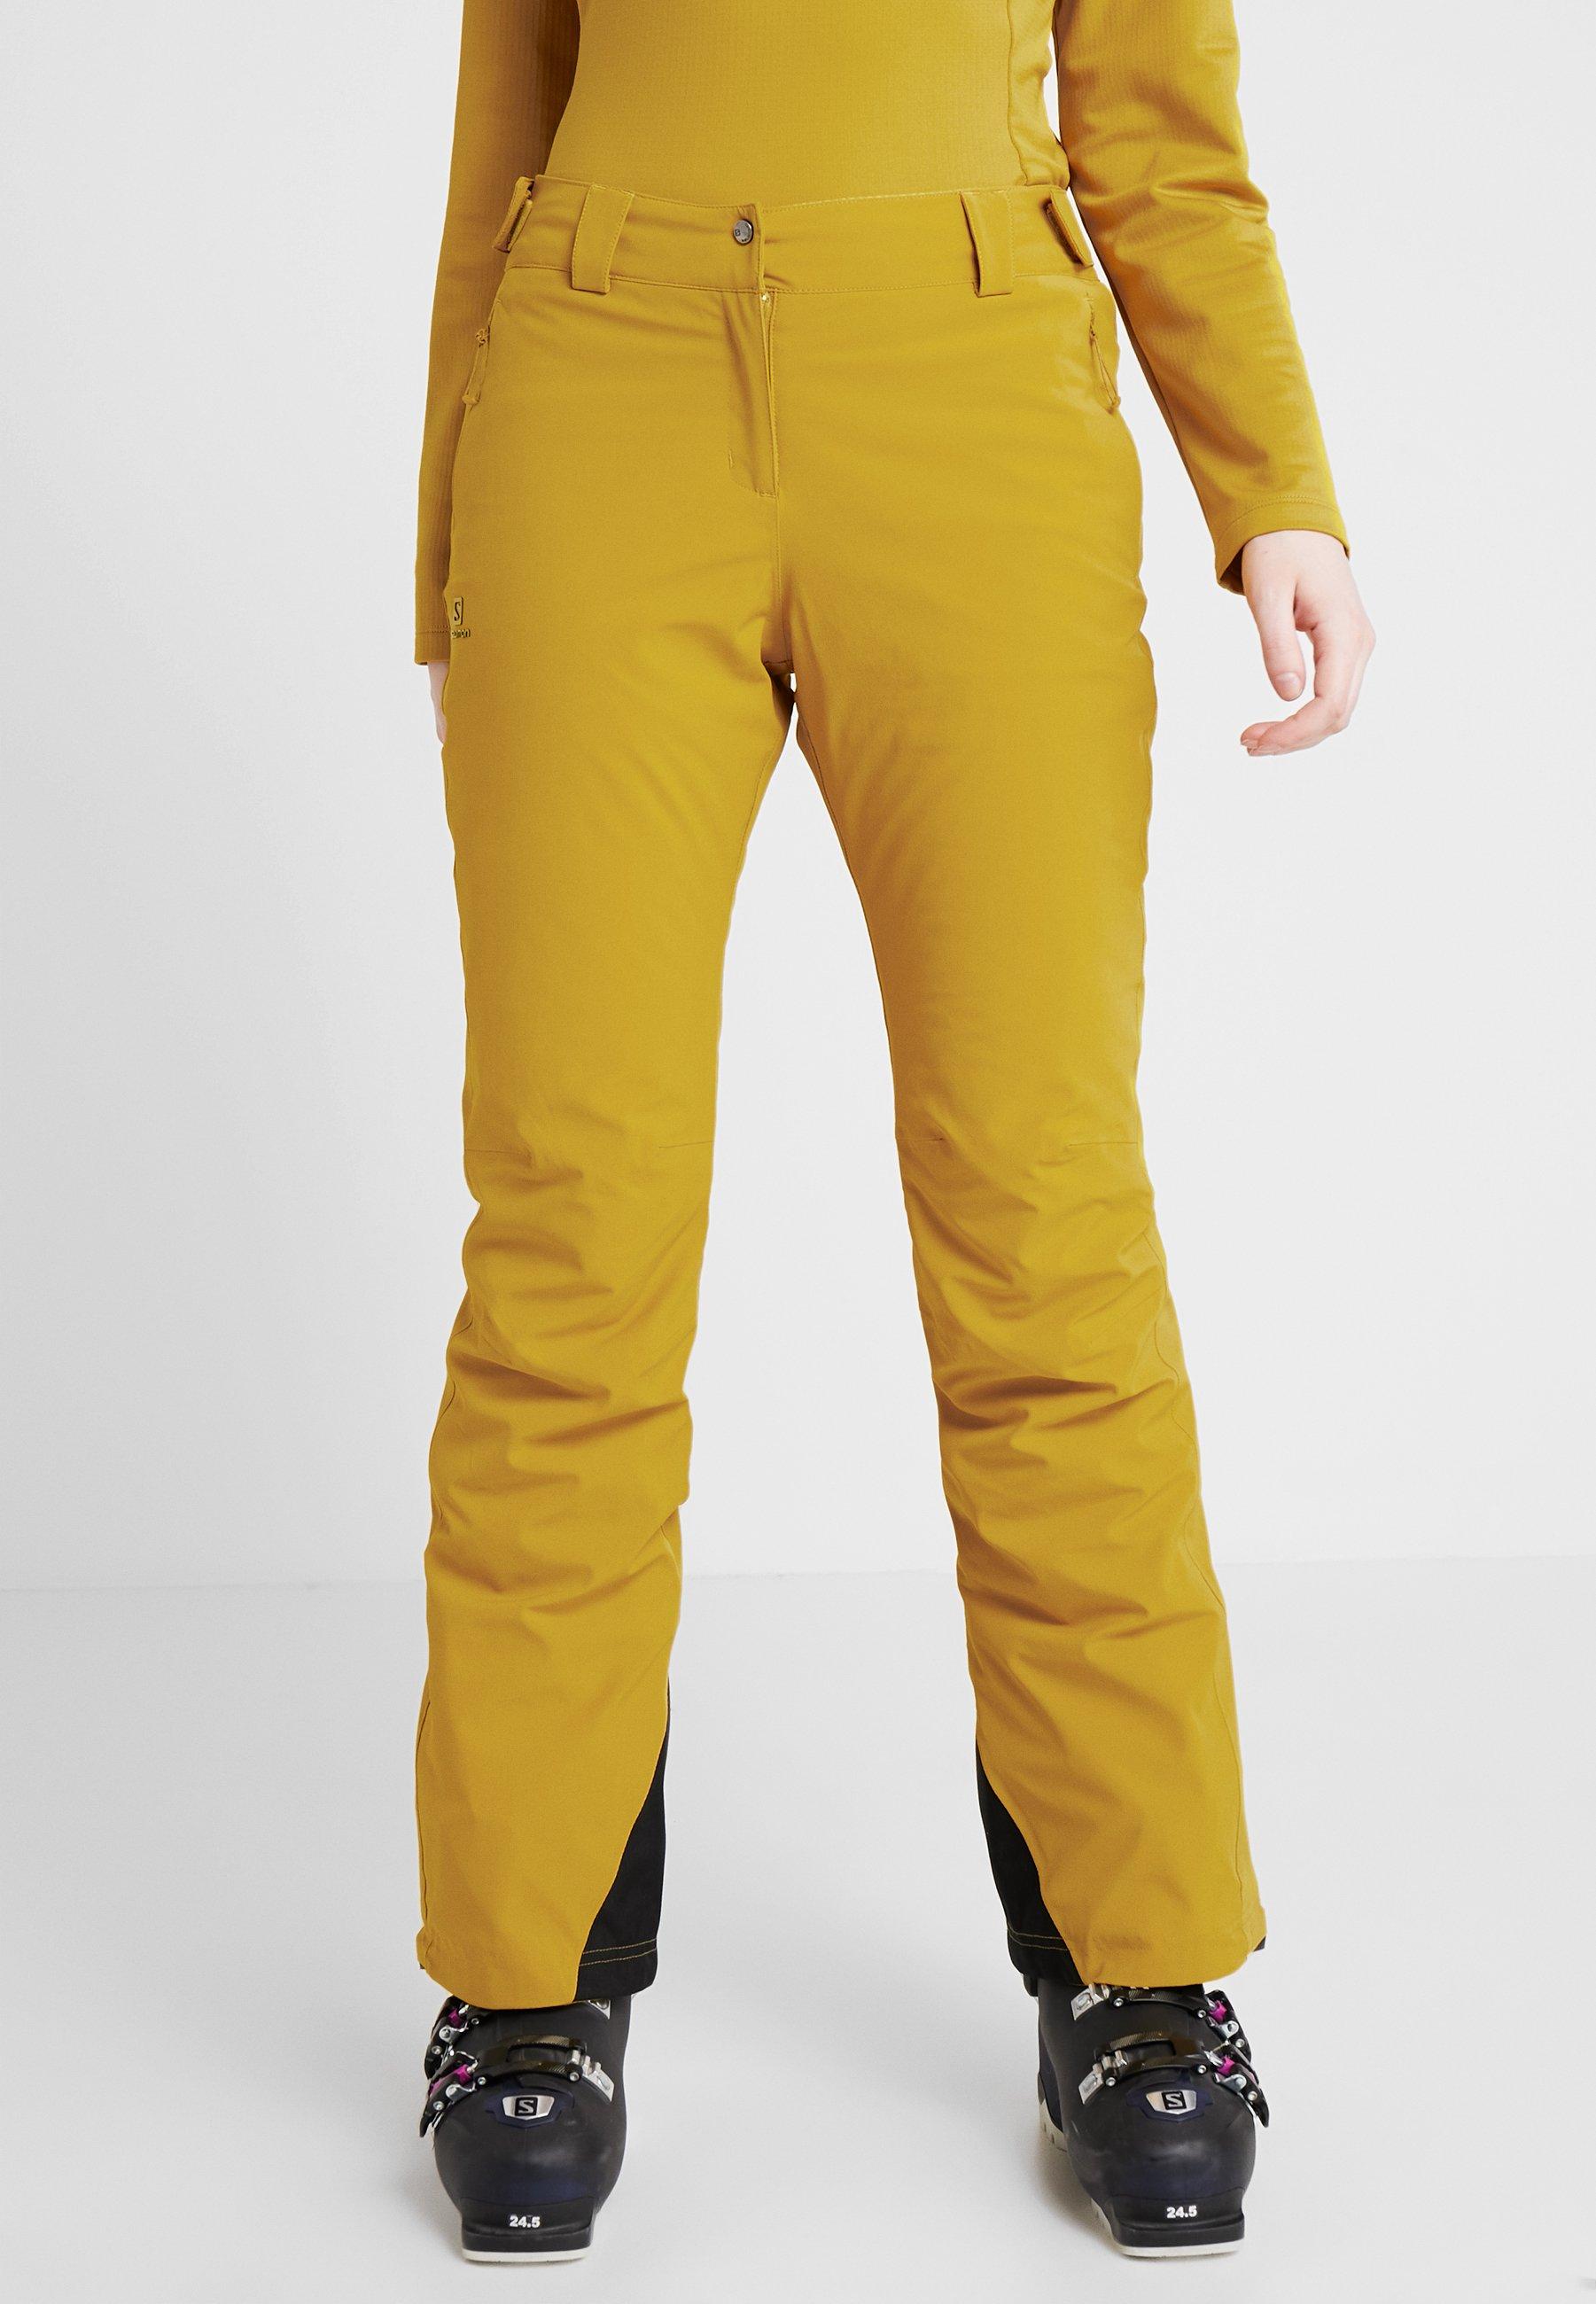 Salomon ICEMANIA PANT - Pantalon de ski golden palm